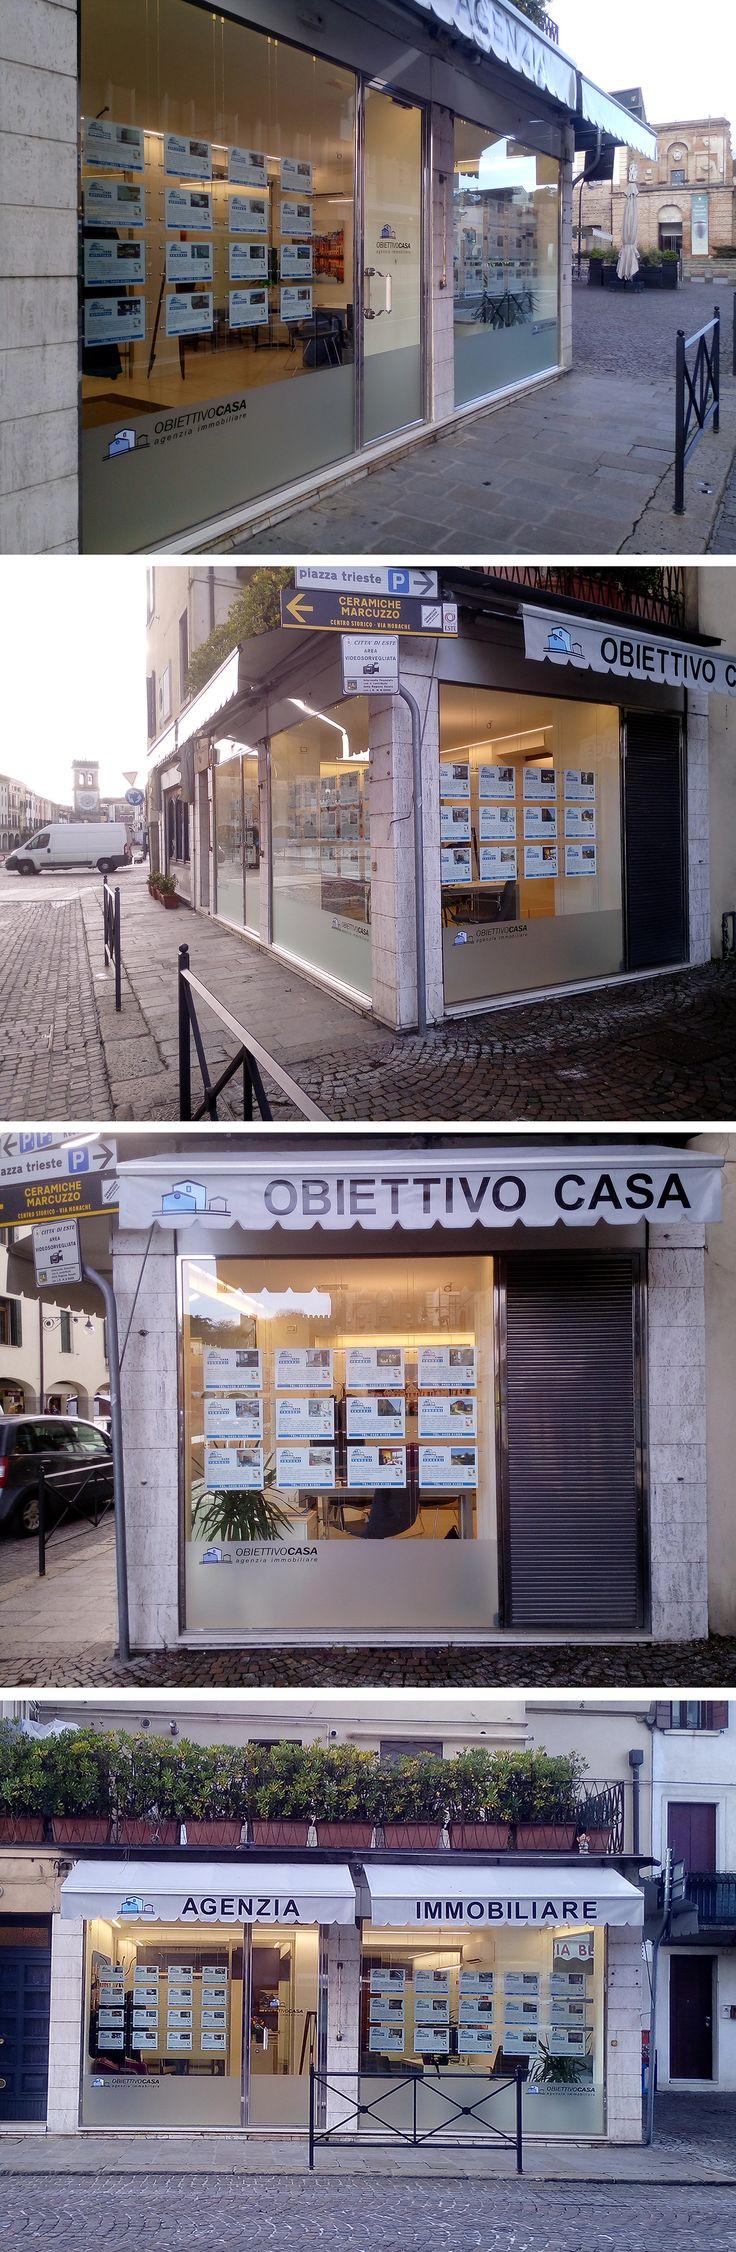 Rivestimenti Adesivi Per Ante Cucina : Rivestimenti adesivi per ...